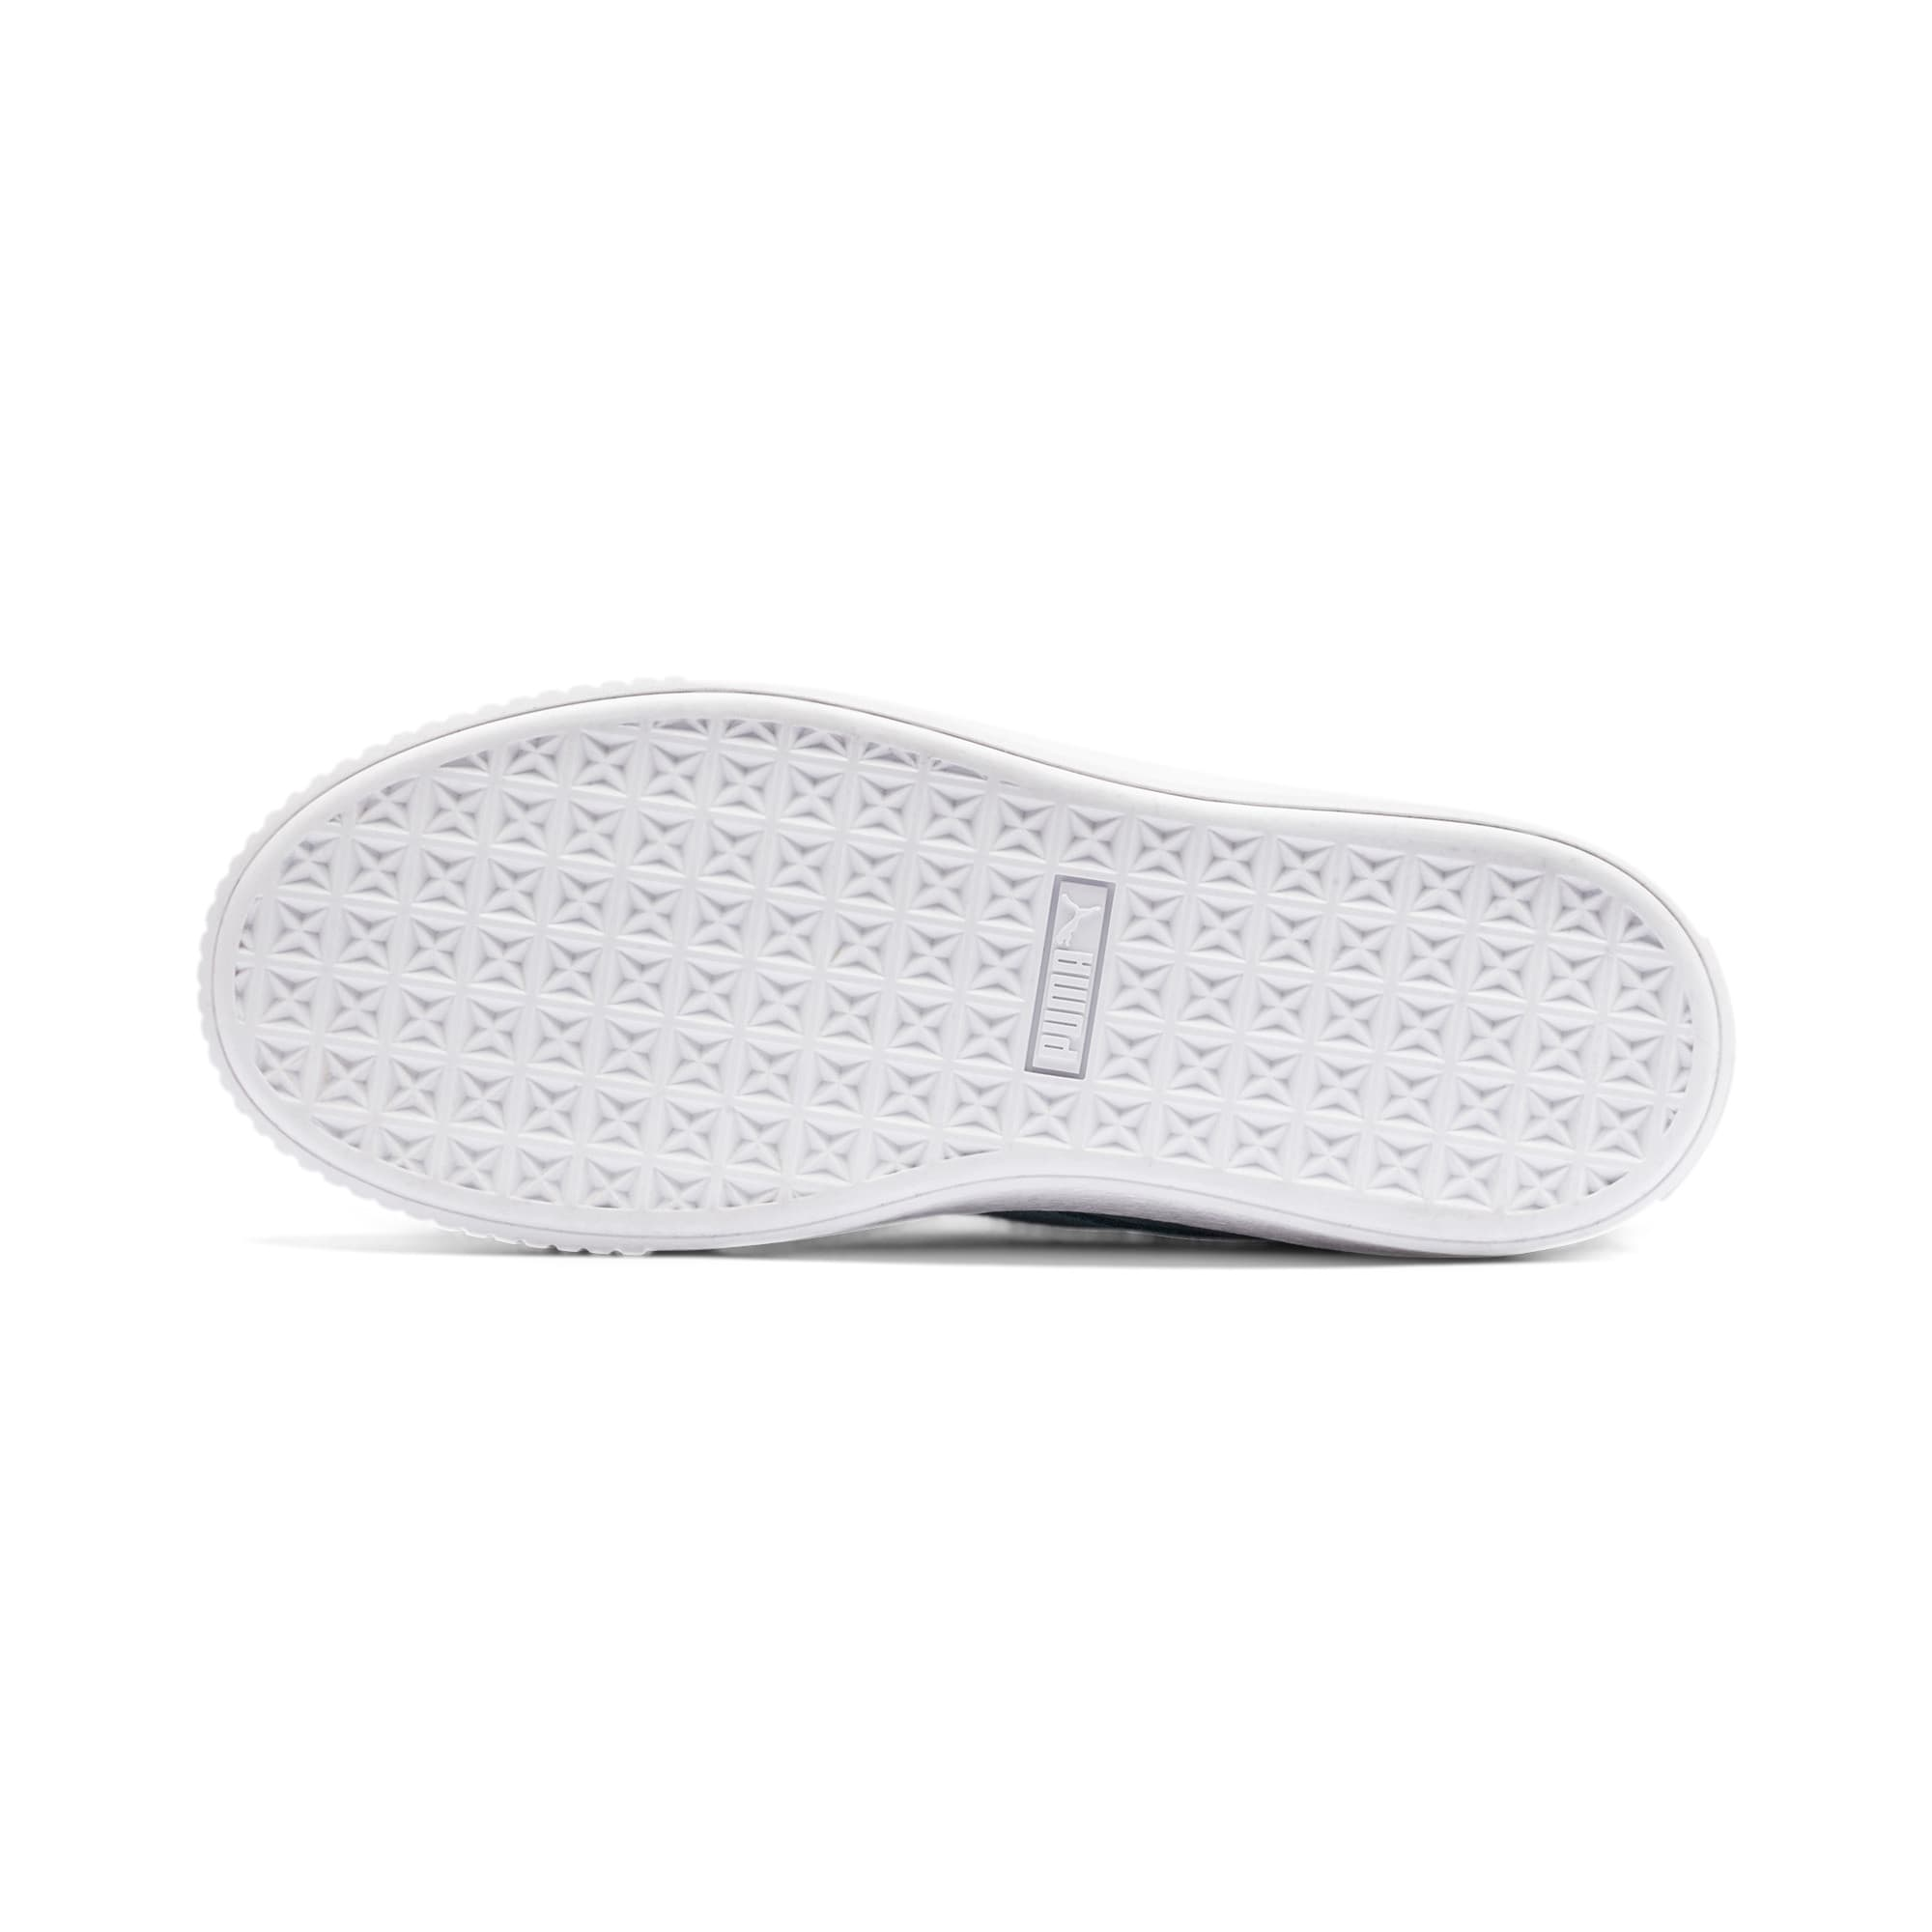 Thumbnail 4 of Suede Platform Women's Sneakers, Bluestone-Puma Team Gold, medium